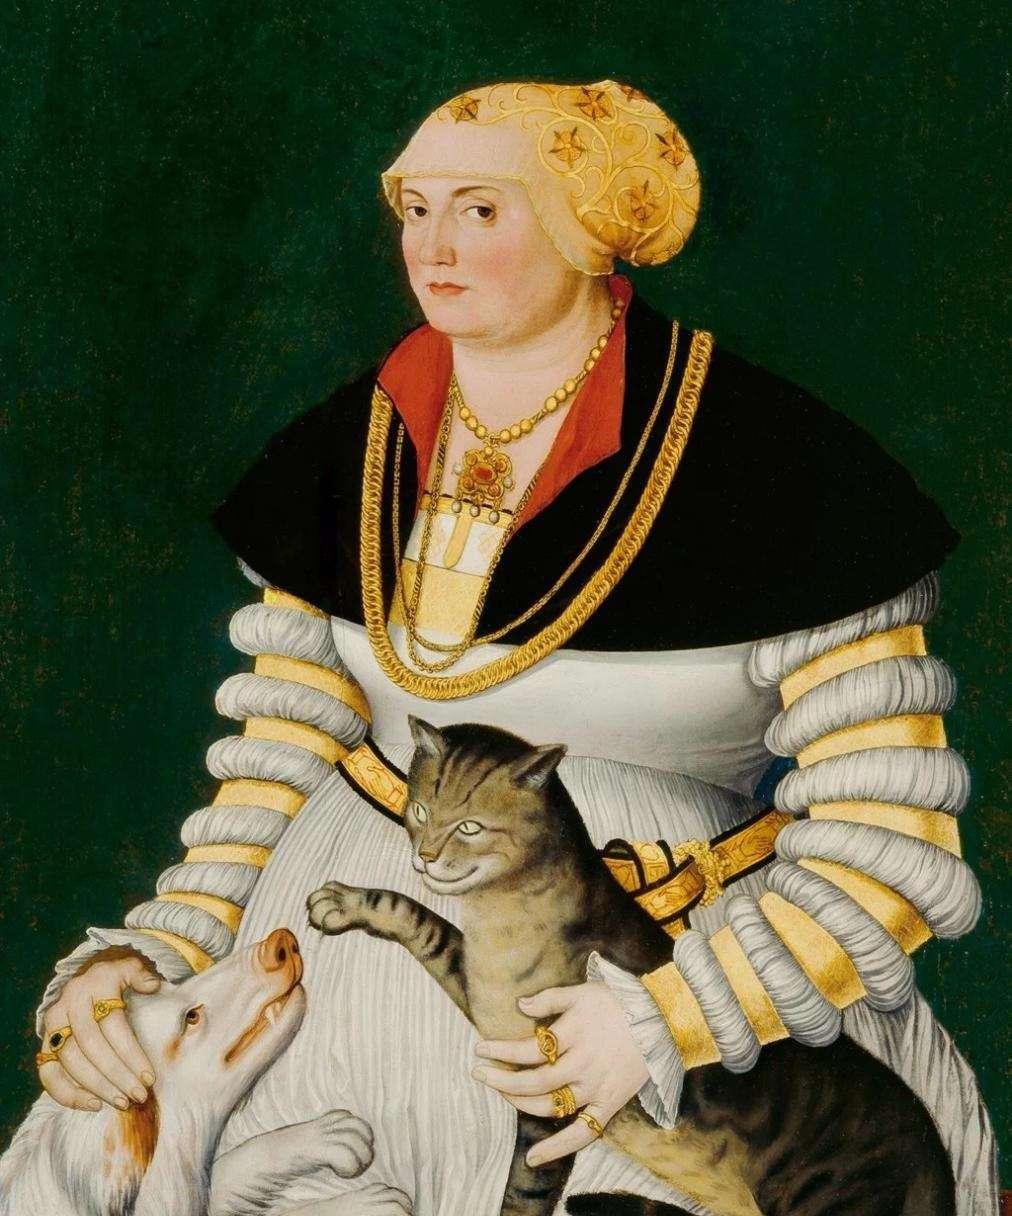 97 12 c35 921 - حیوانات در تابلوهای نقاشی قرون وسطا چه مفهومی داشتند؟